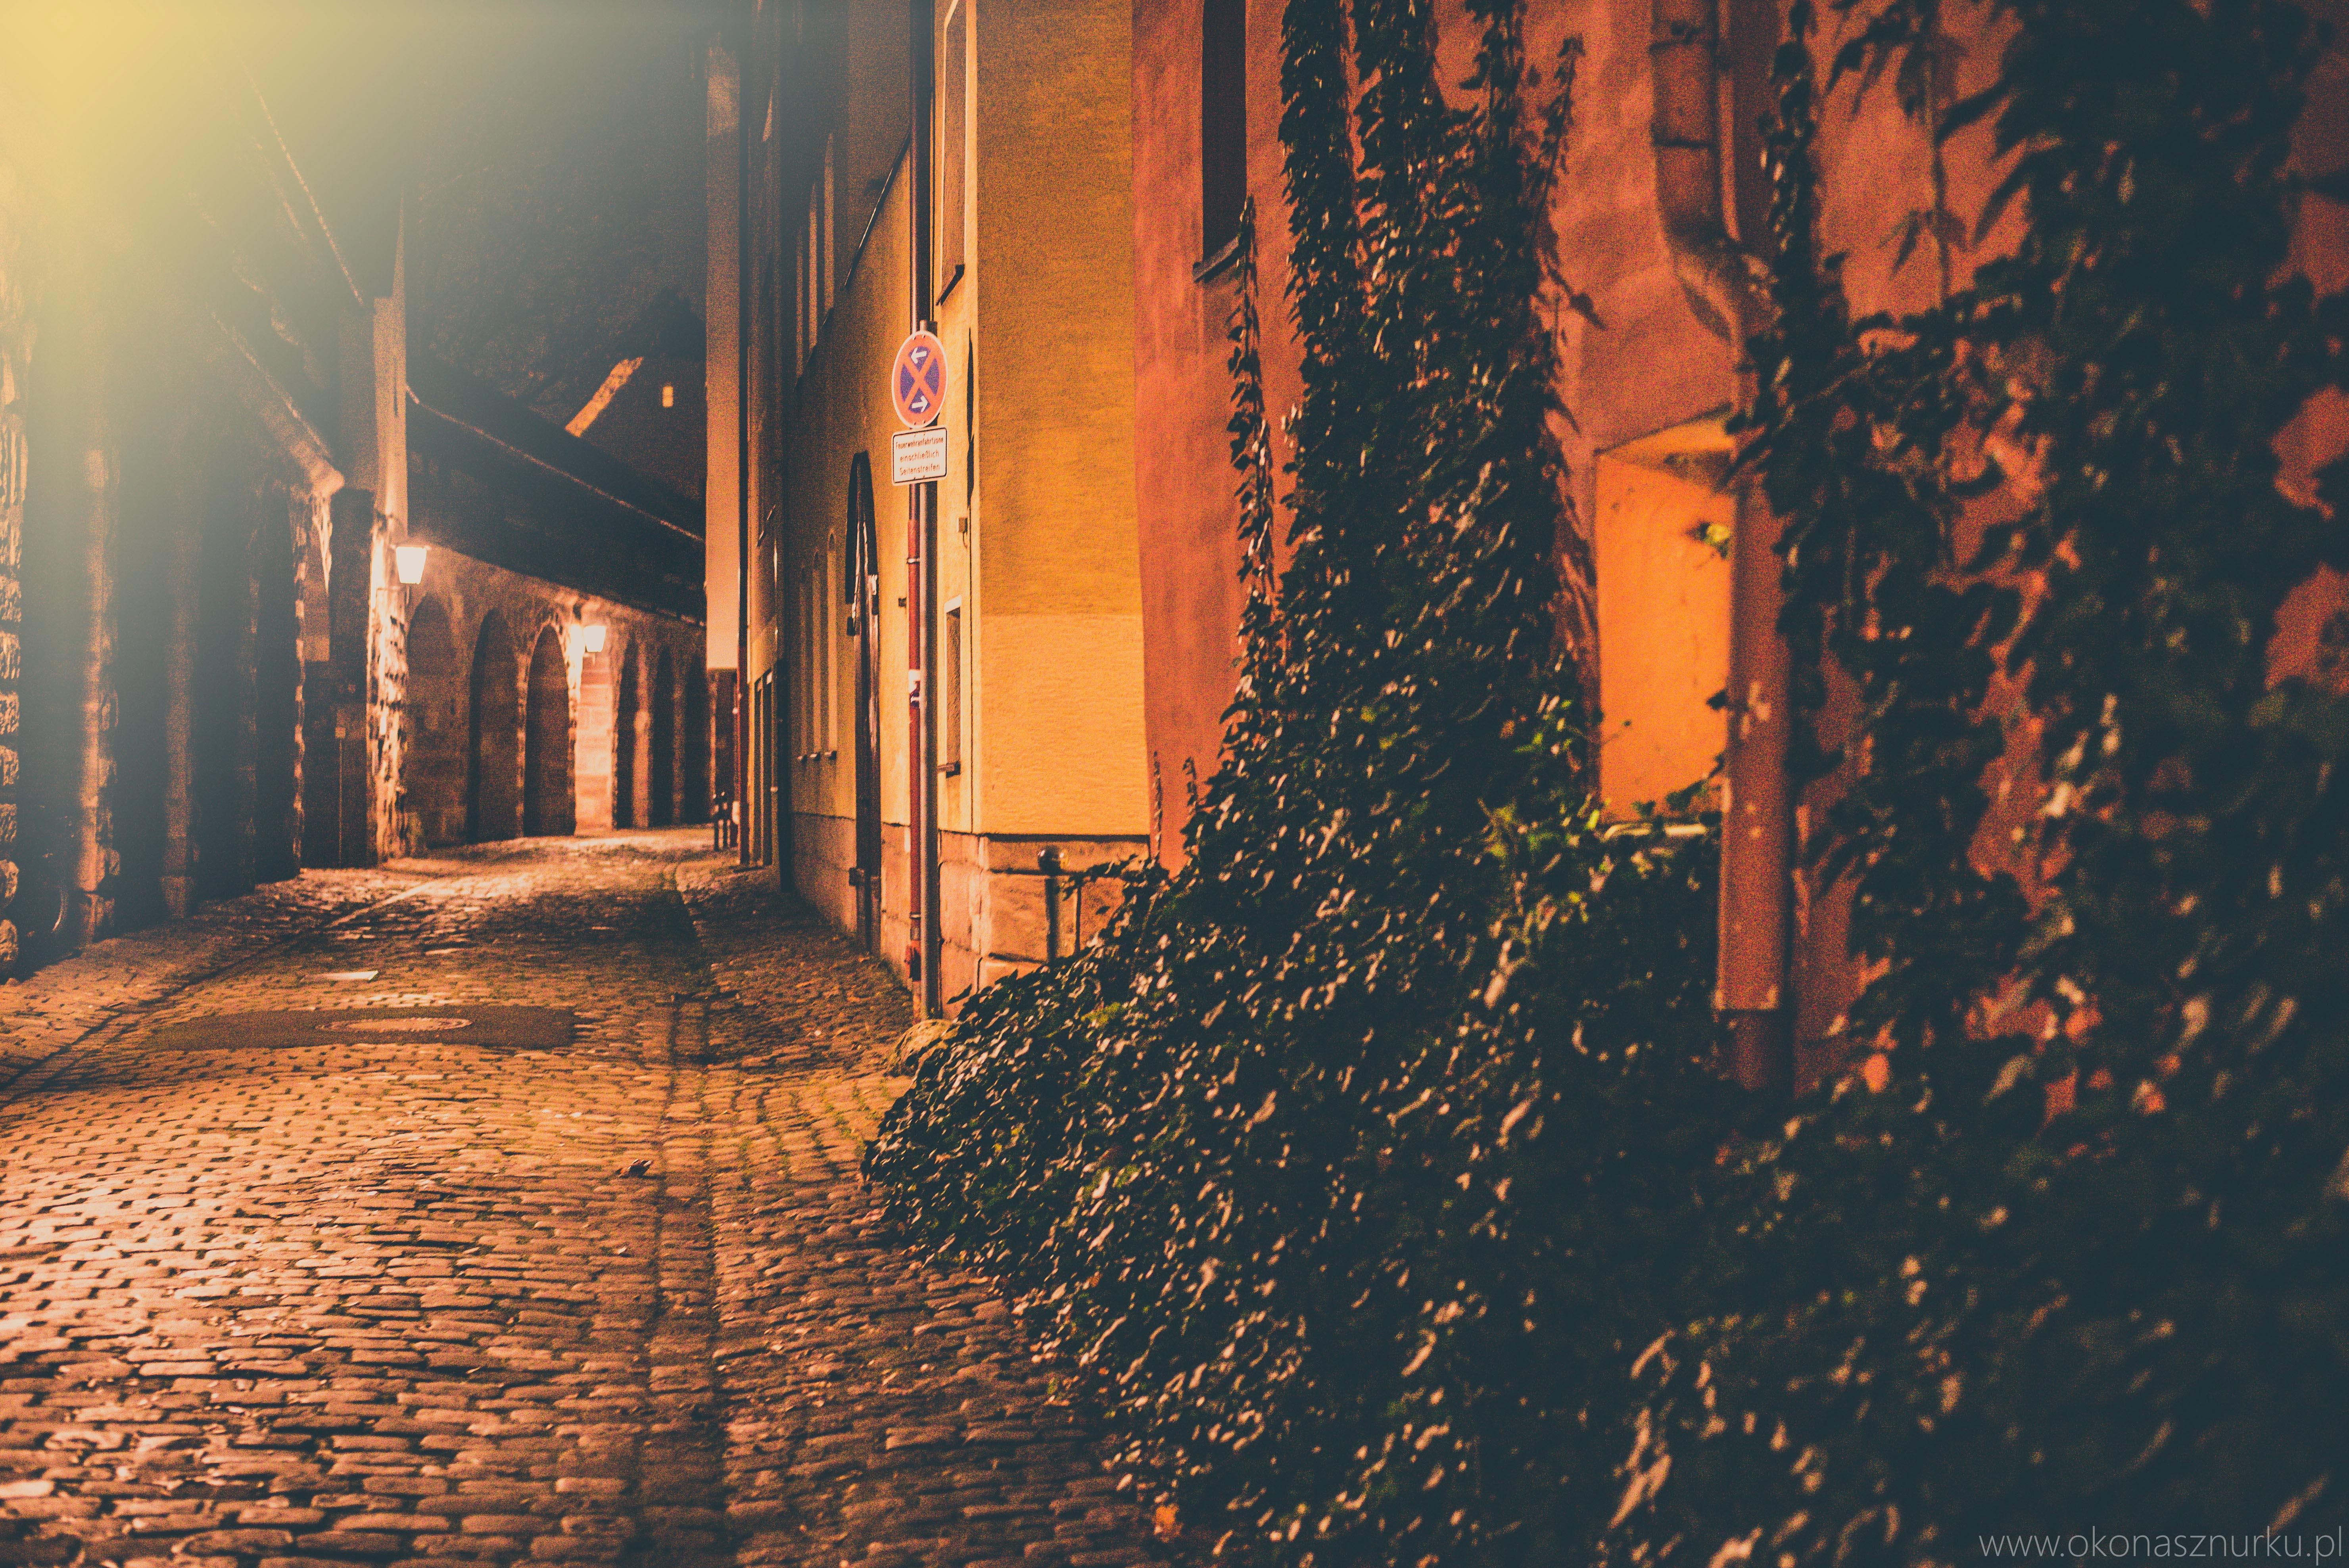 Nürnberg-stadt-norymberga-bayern-city-frankonia (42)